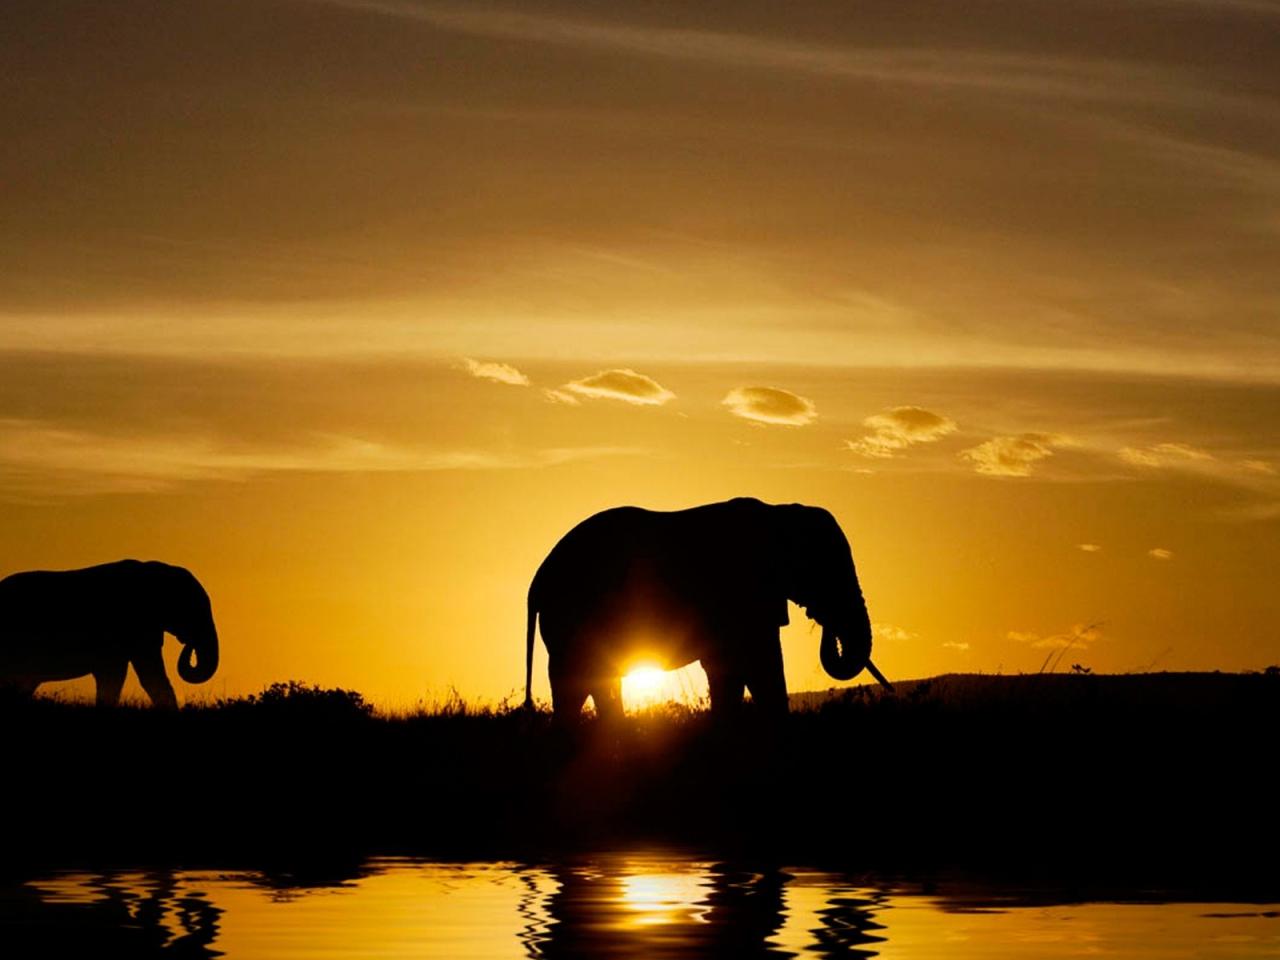 Elefantes en atardecer - 1280x960